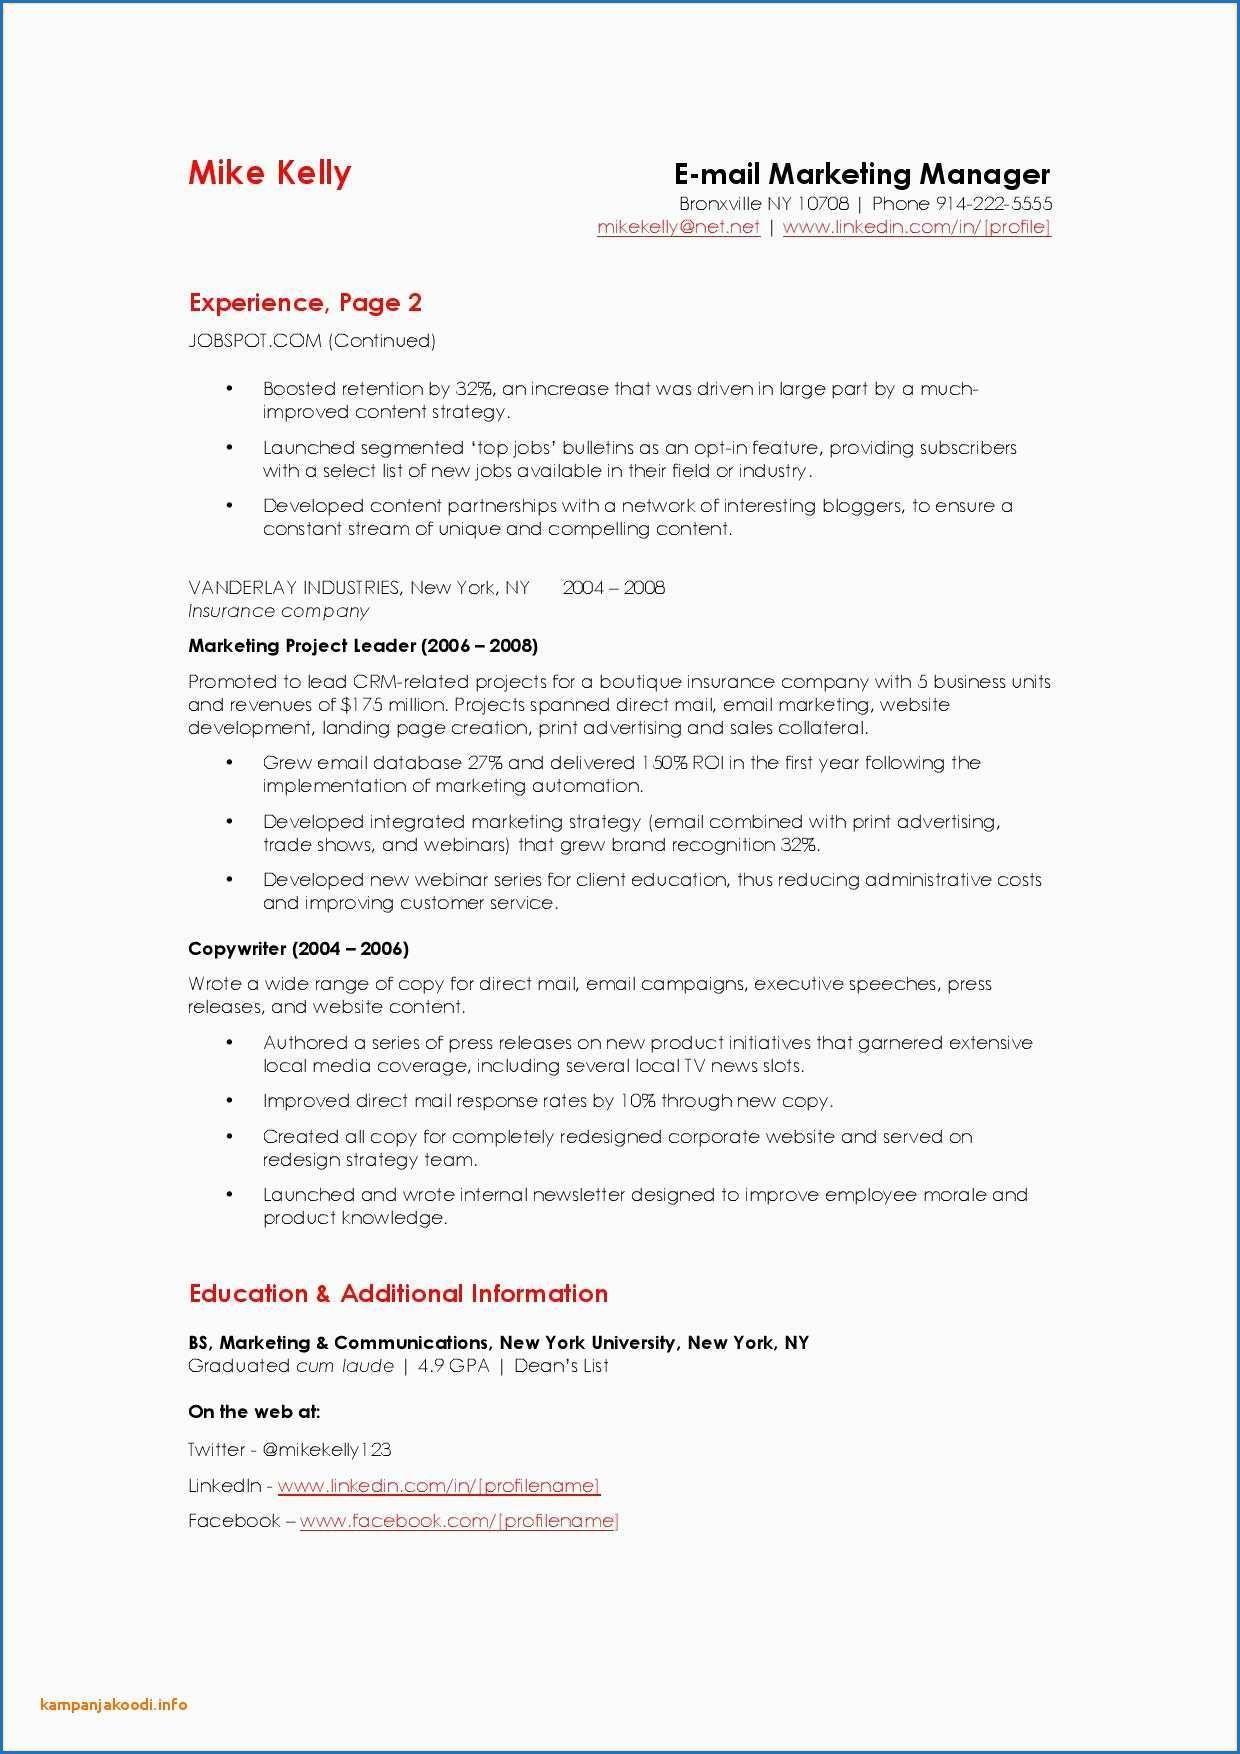 15 Sample Resume For Technical Sales Manager Check More At Https Www Ortelle Org Sample Resume For Technical Sales Manager